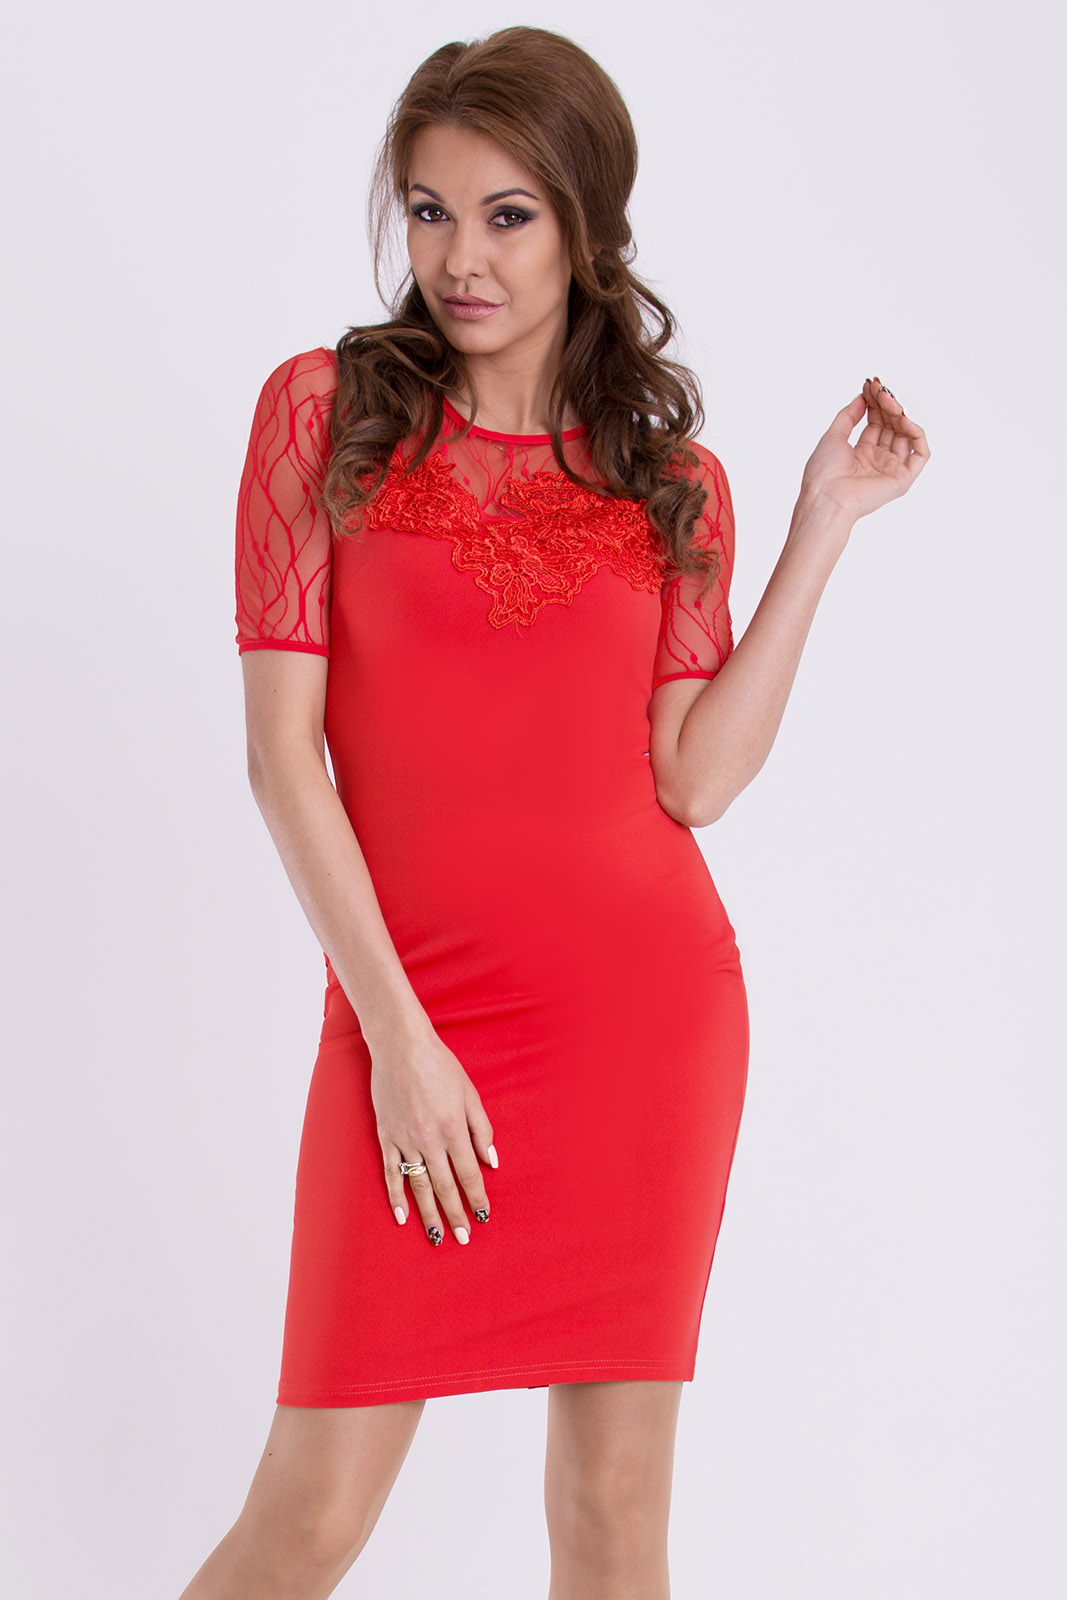 EMAMODA DRESS - RED 13006-2